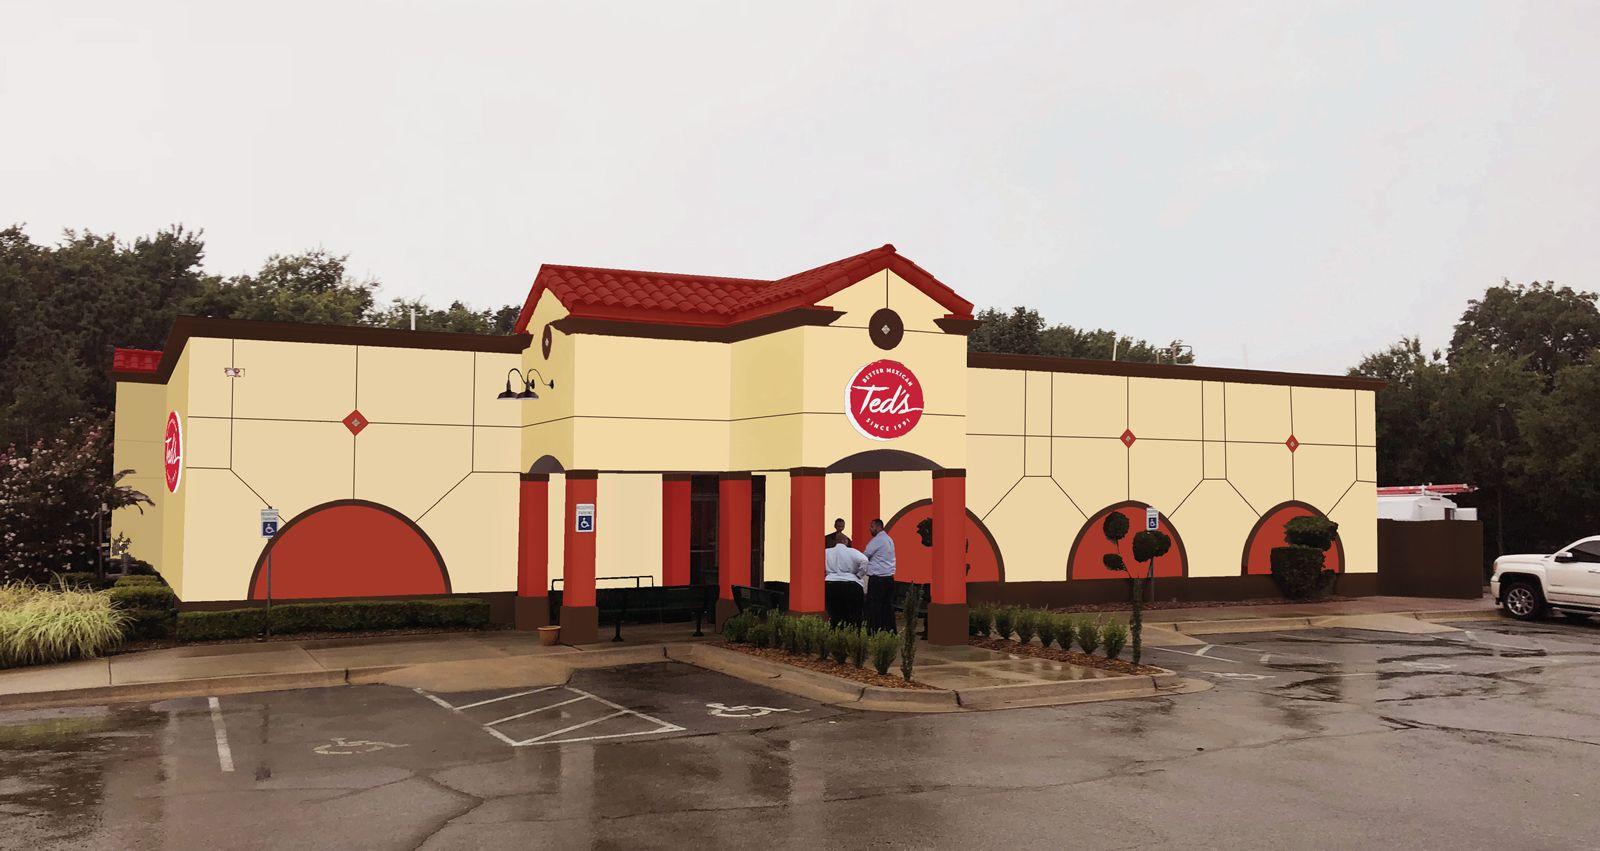 Local Favorite to Remodel Edmond Restaurant